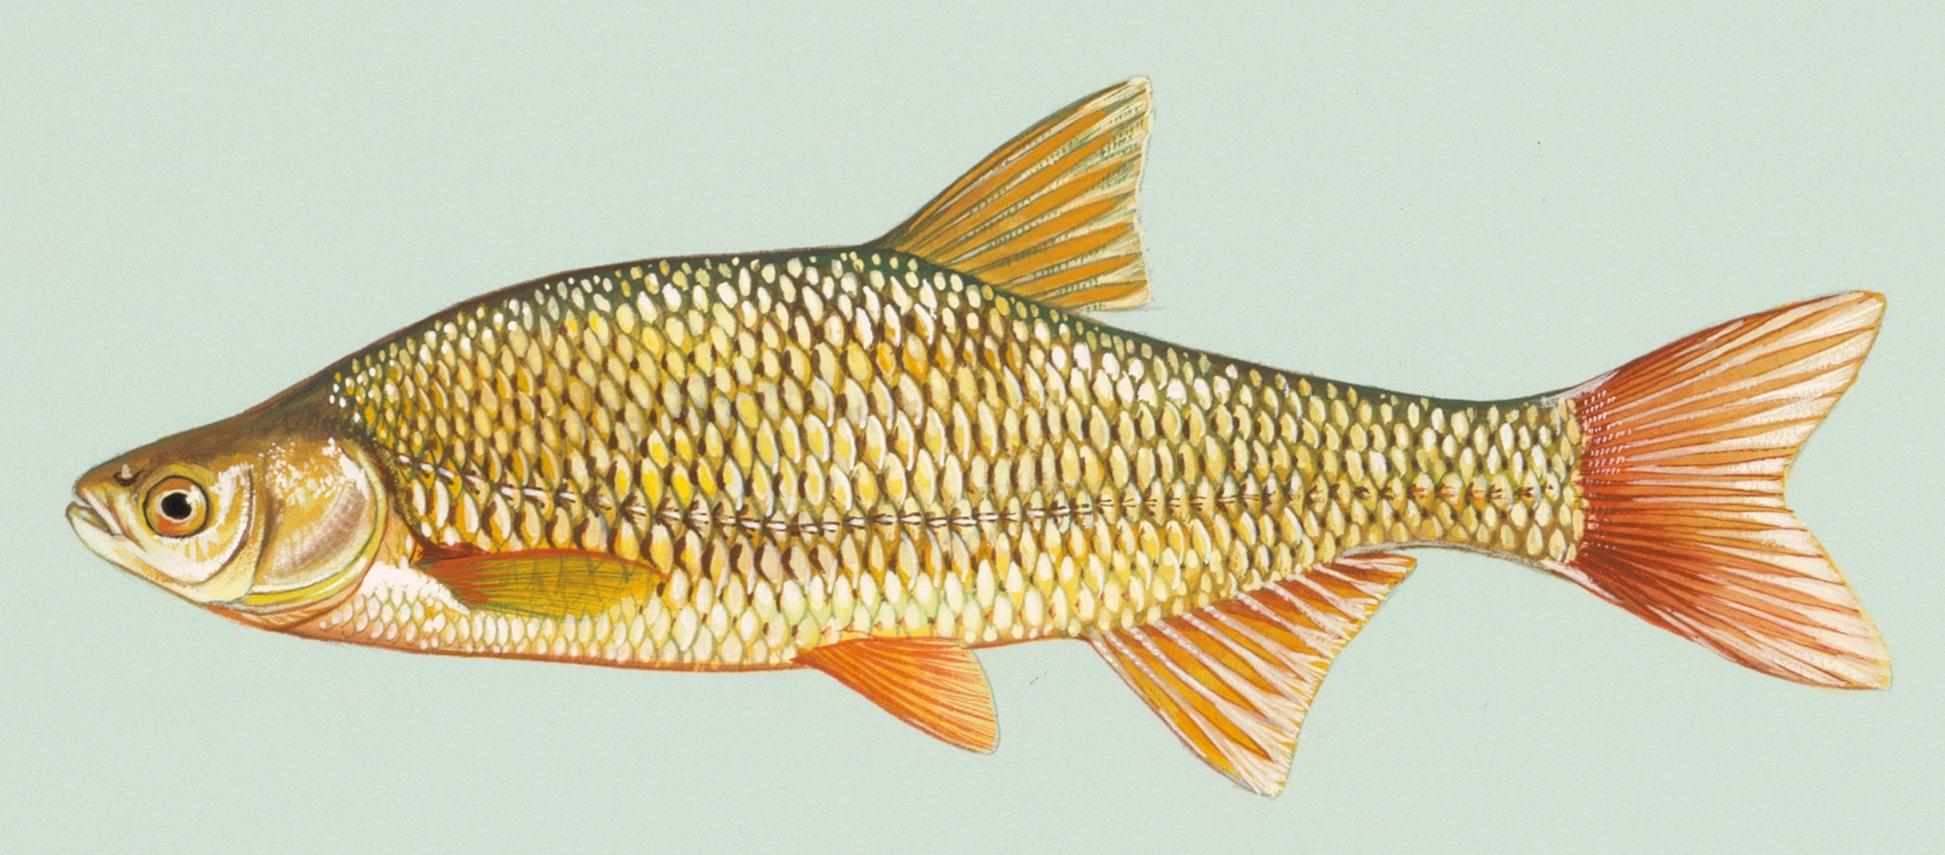 Image of Notemigonus crysoleucas